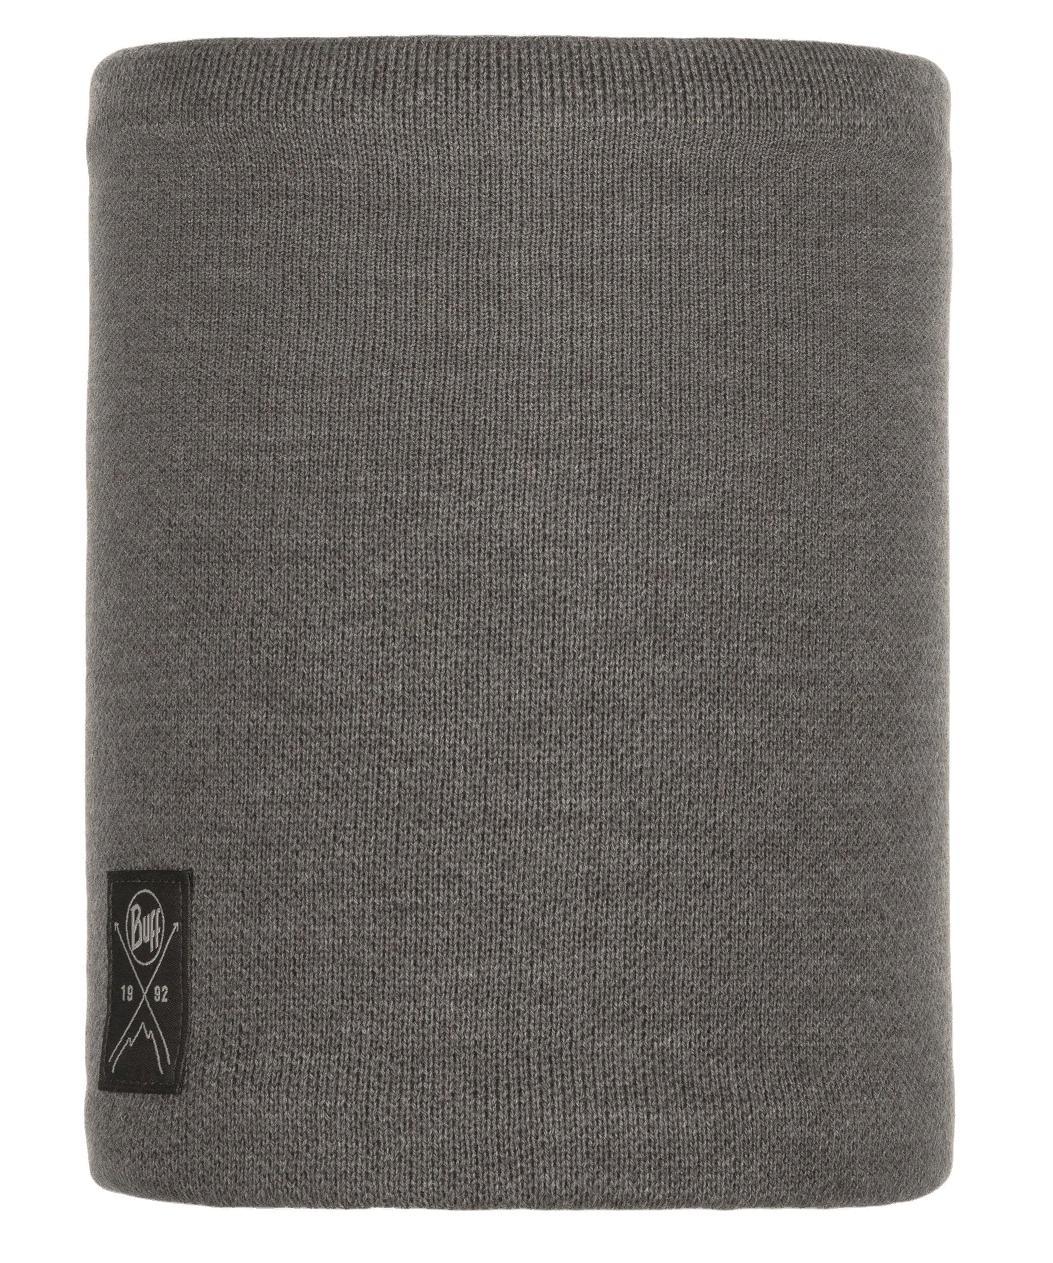 Шарф Buff Knitted & Polar Neckwarmer Neo Grey